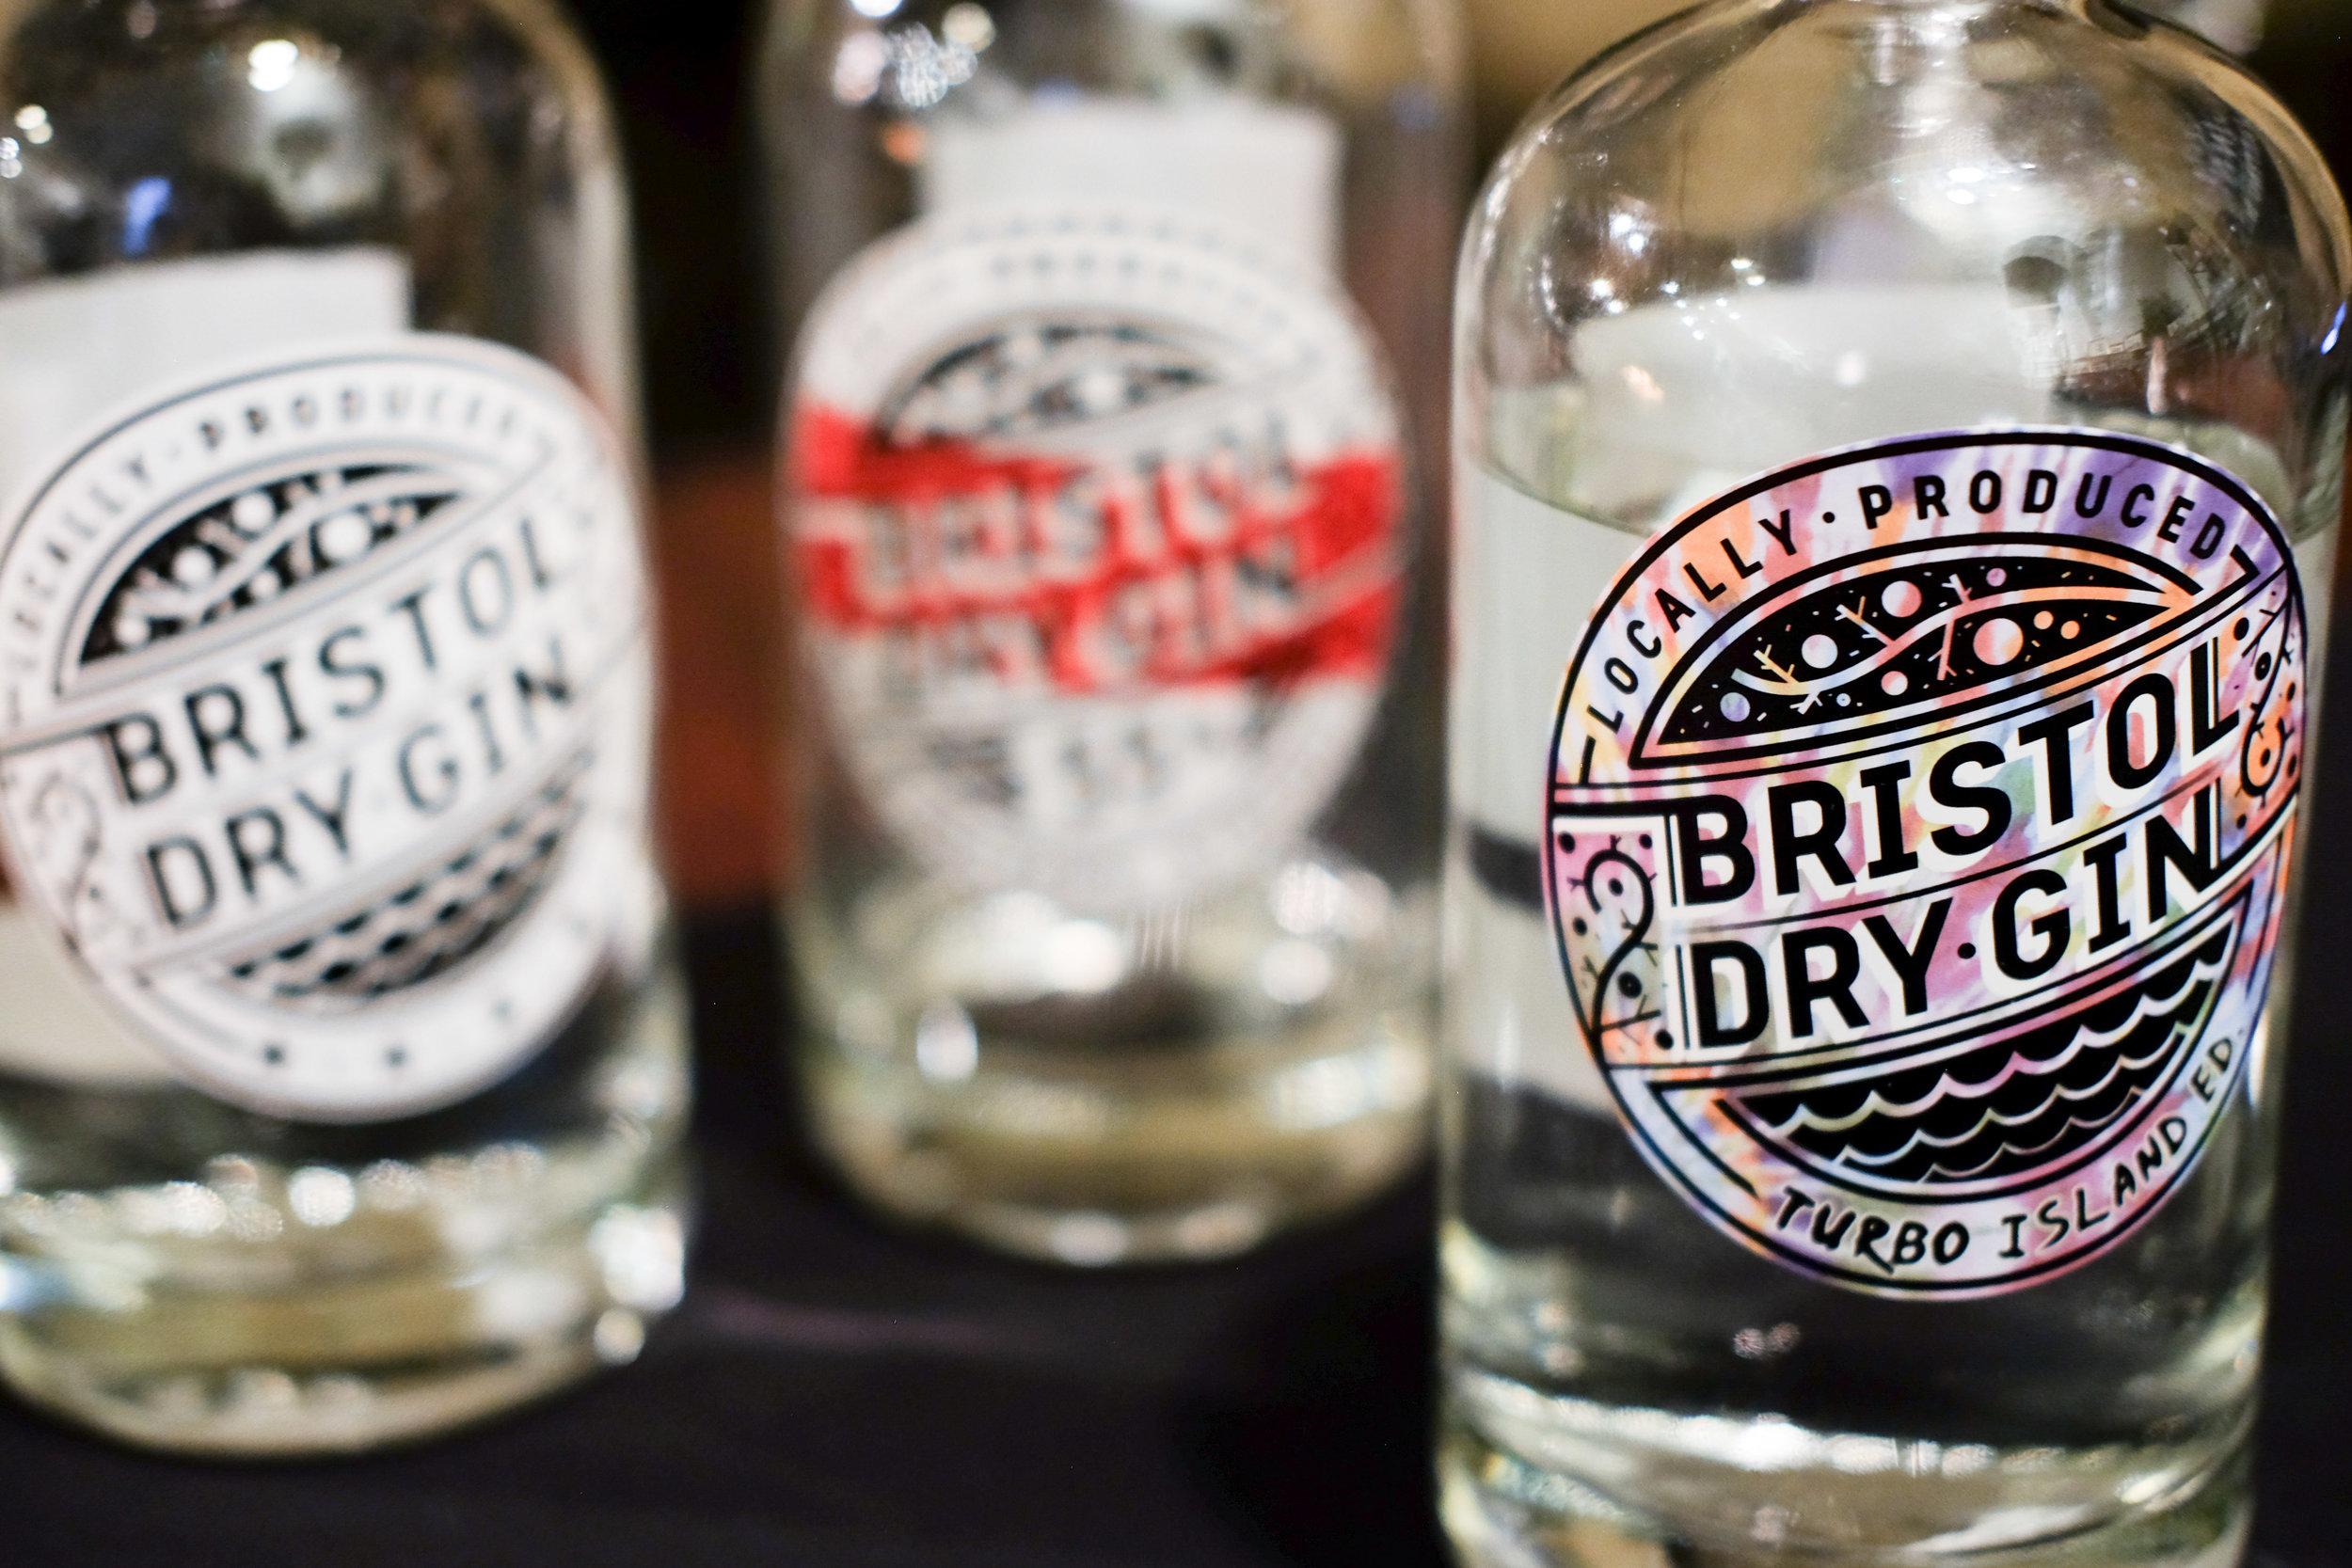 bristol_dry_gin_bottles